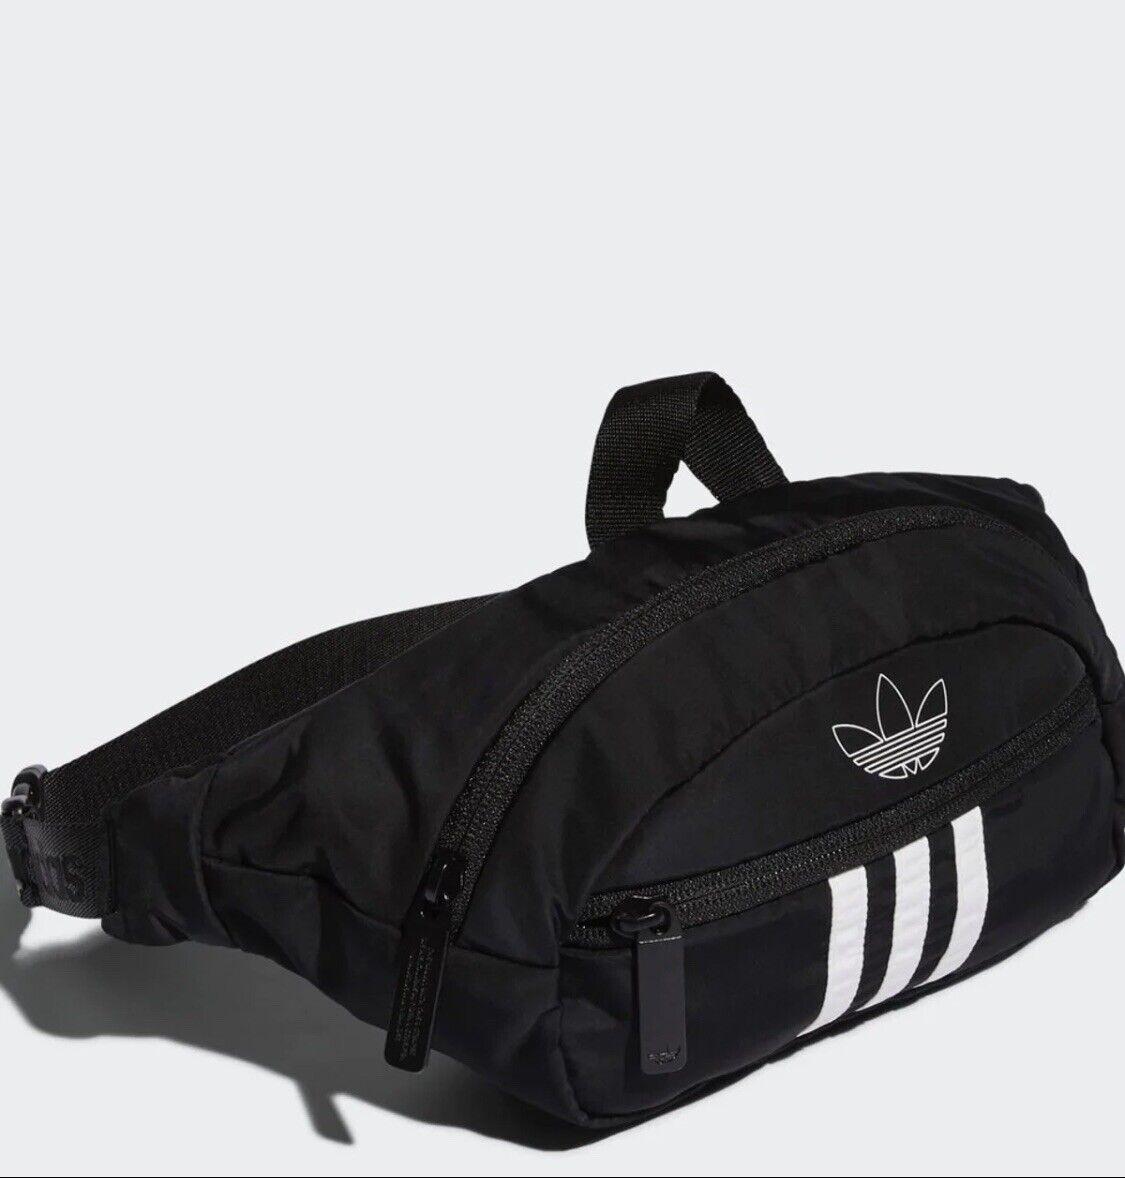 New Adidas three stripes Unisex Fanny Pack Waist Bag Belt Ba